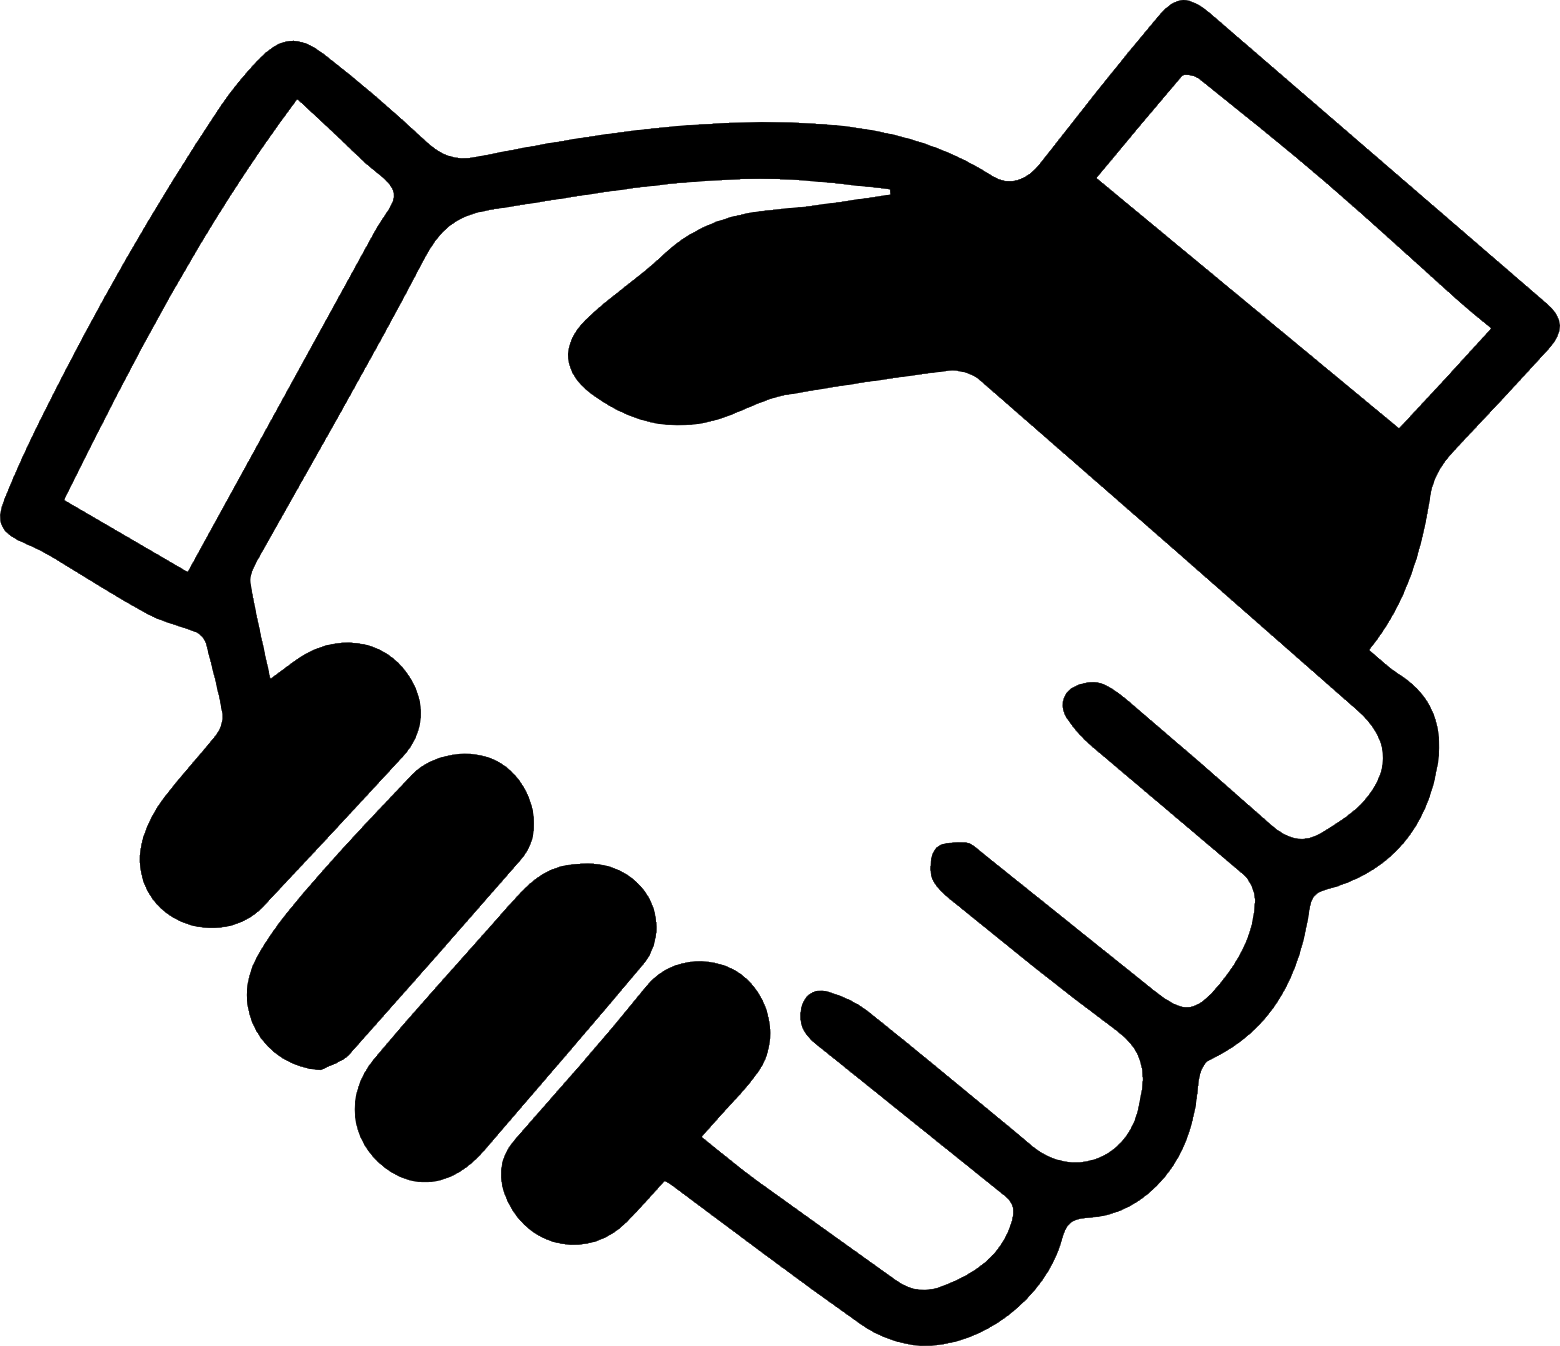 Картинки по запросу рукопожатие символ